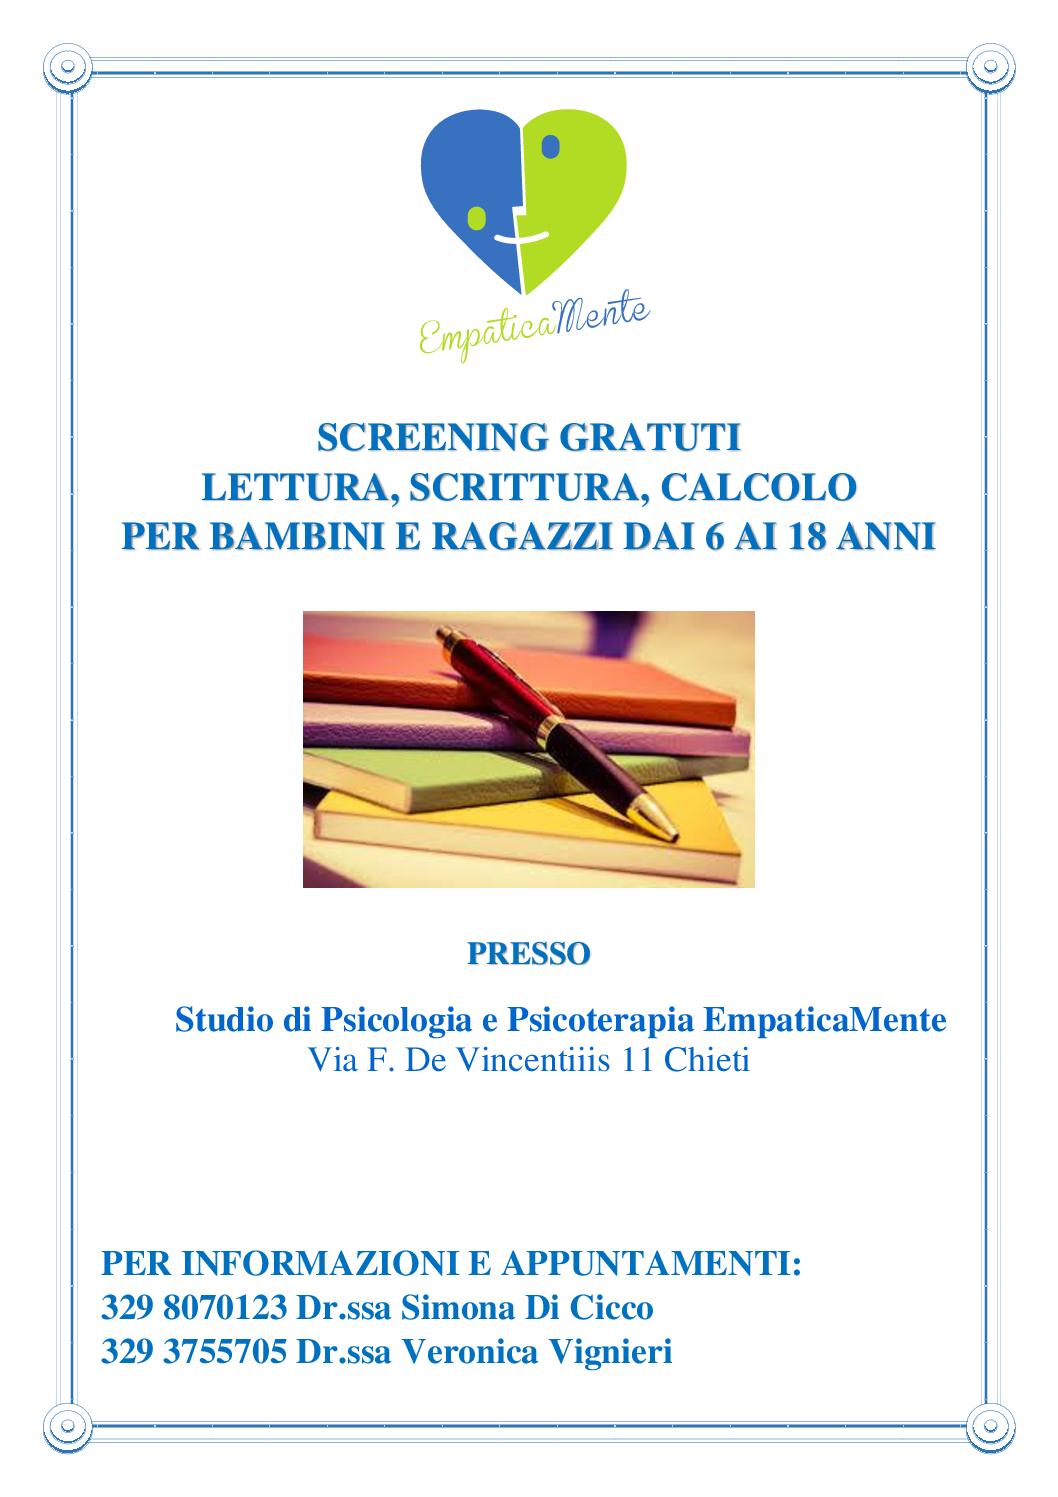 SCREENING 3 pdf - SCREENING LETTURA SCRITTURA CALCOLO